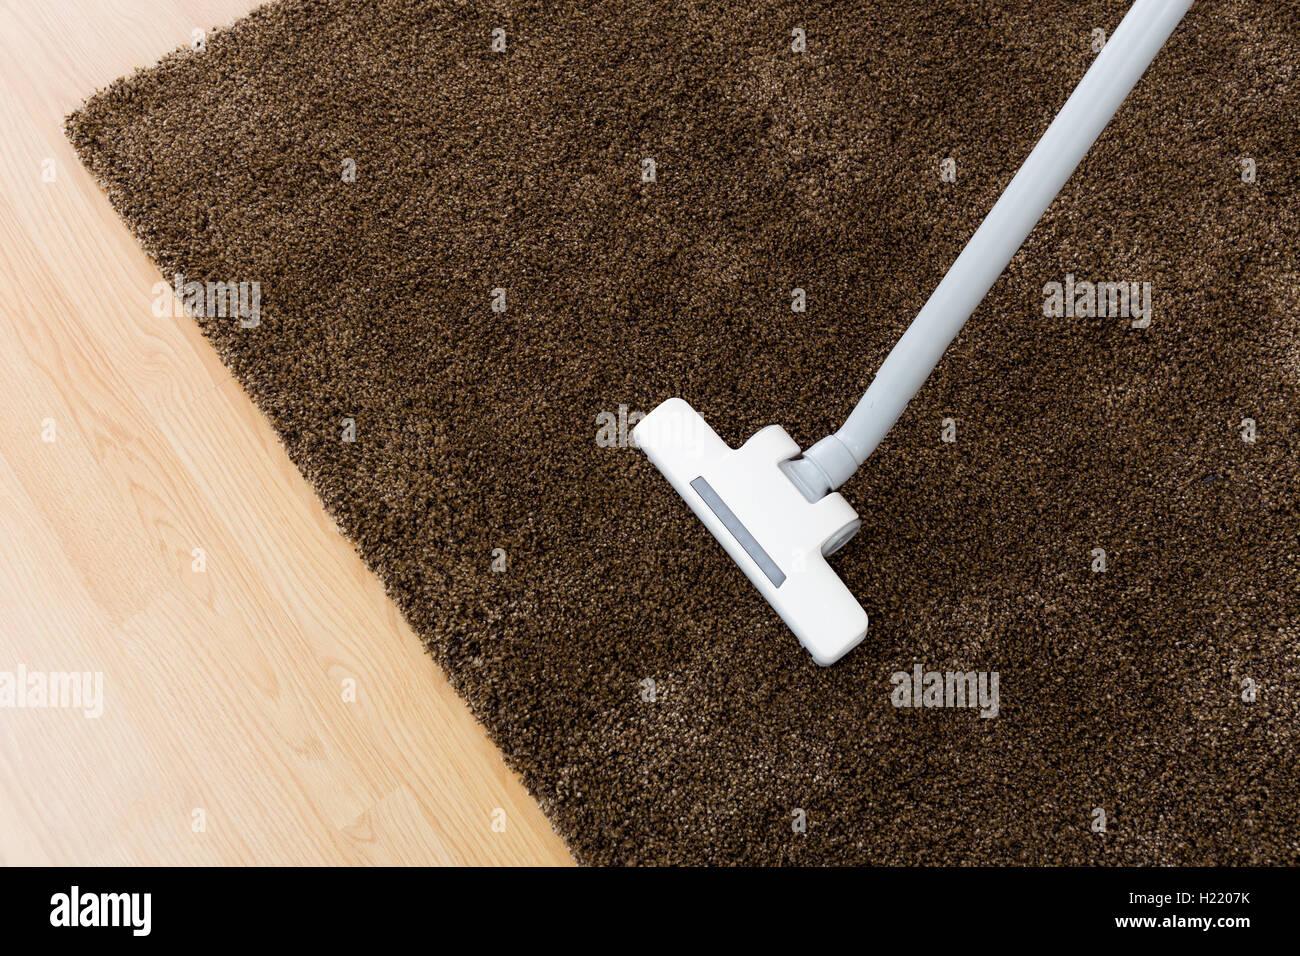 Head of modern vacuum cleaner on carpet - Stock Image